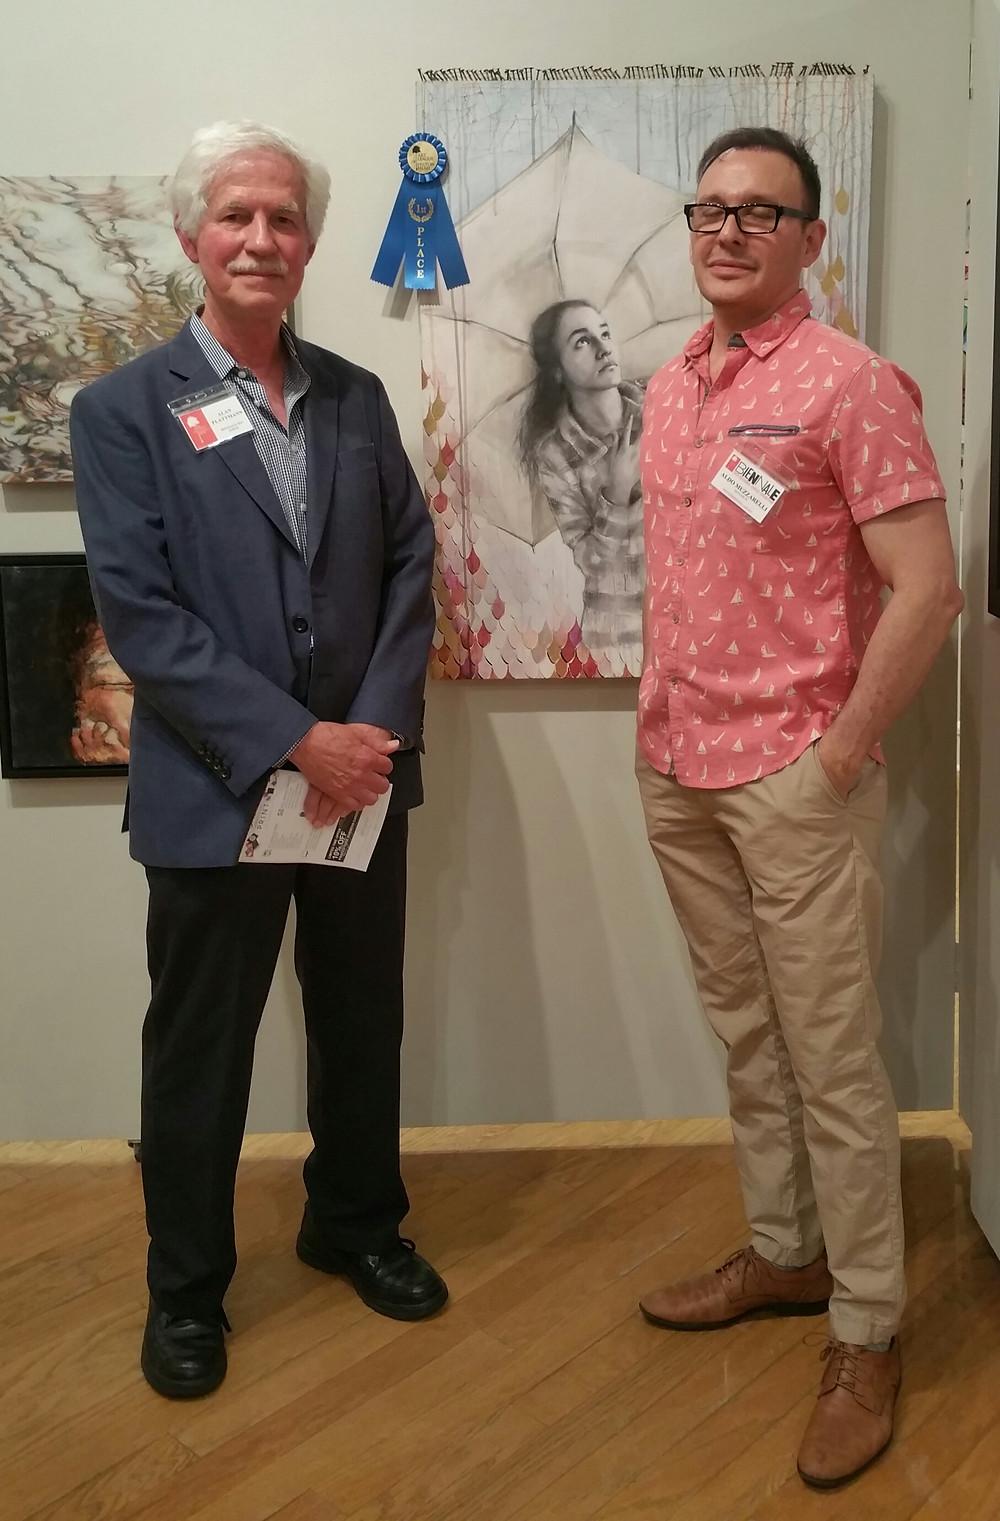 Alan Flattmann 26th biennale national juried exhibition Hilton Head Island SC.